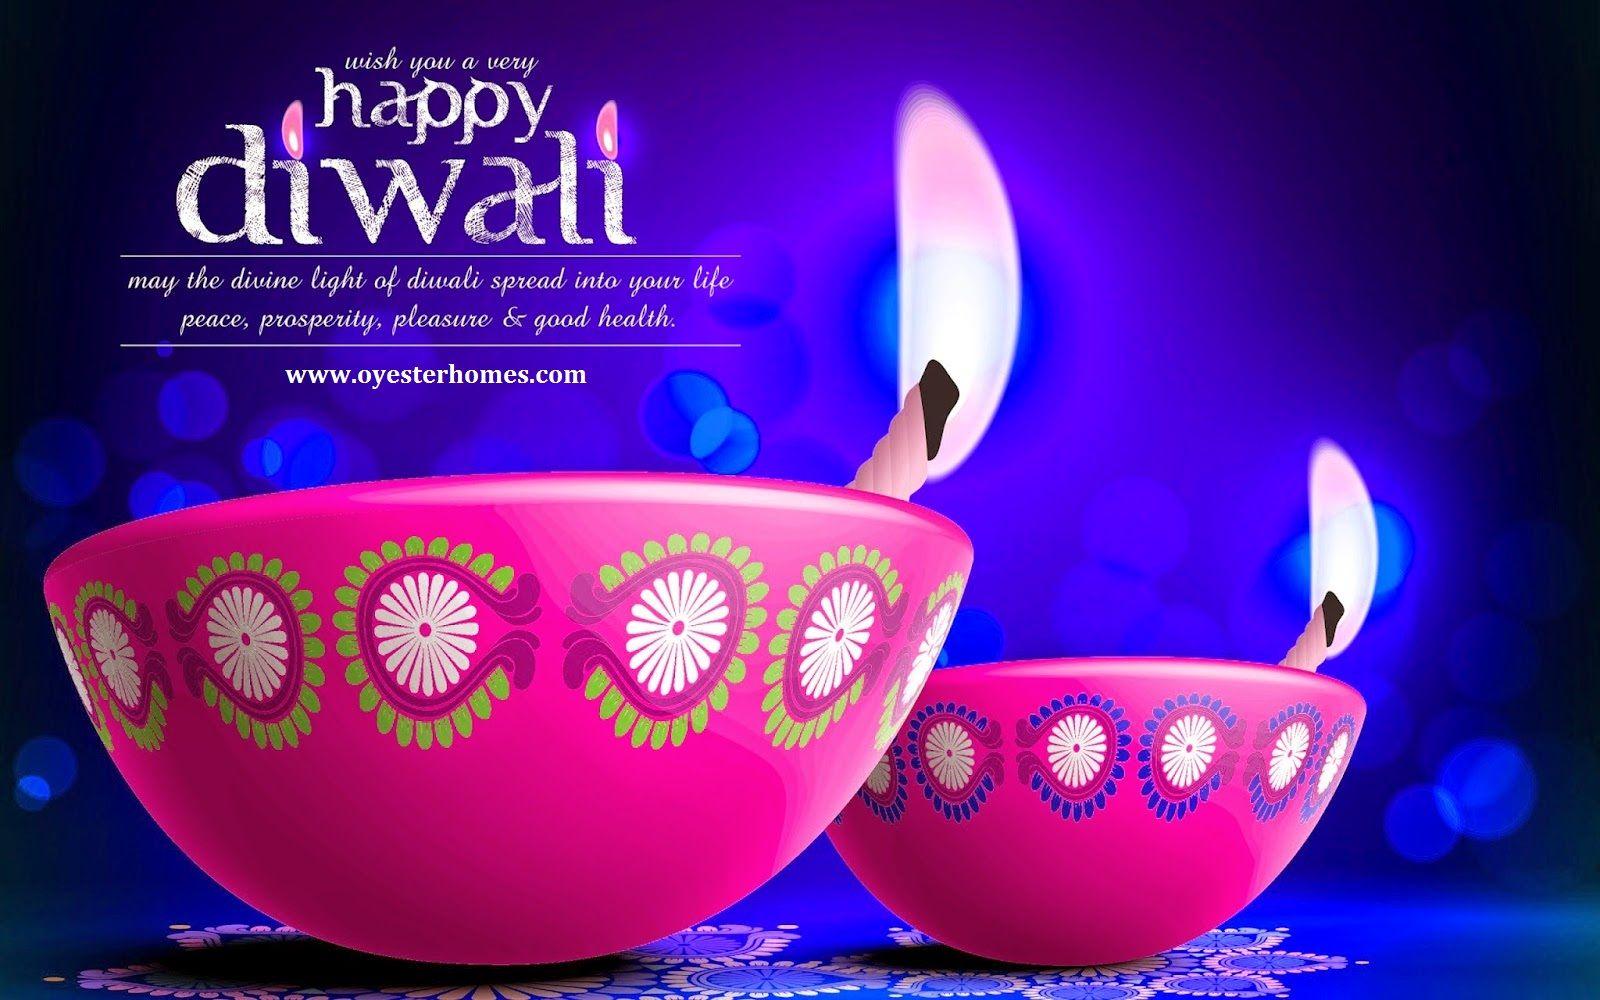 Happy Deepavali! #happydiwaligreetings